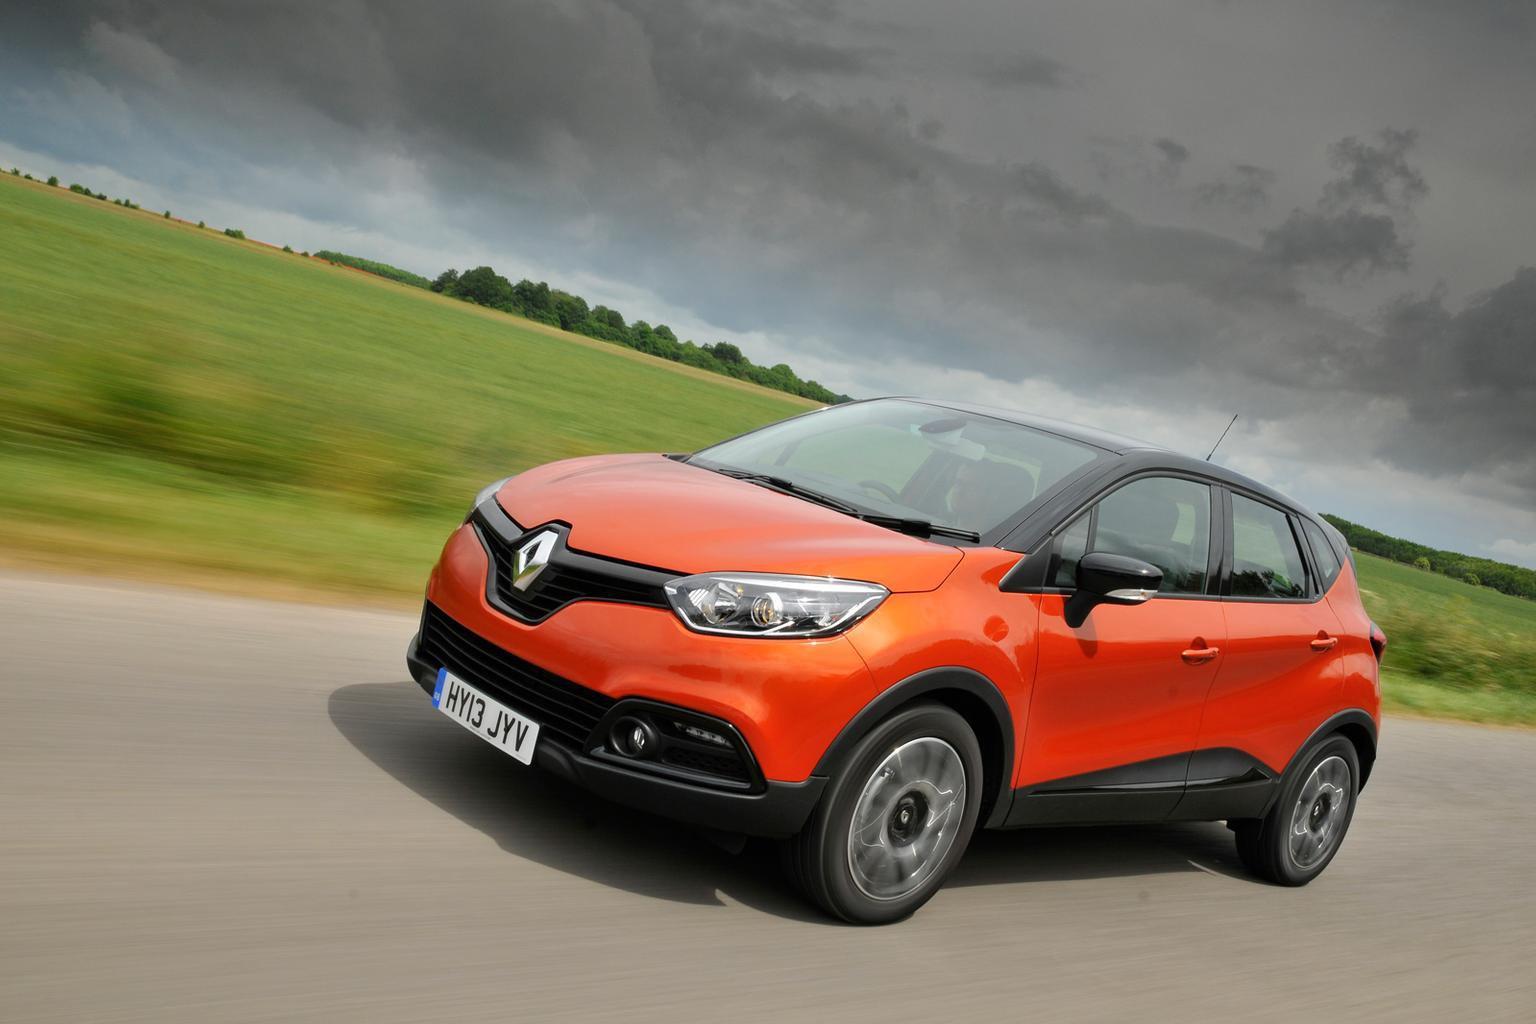 2013 Renault Captur range review